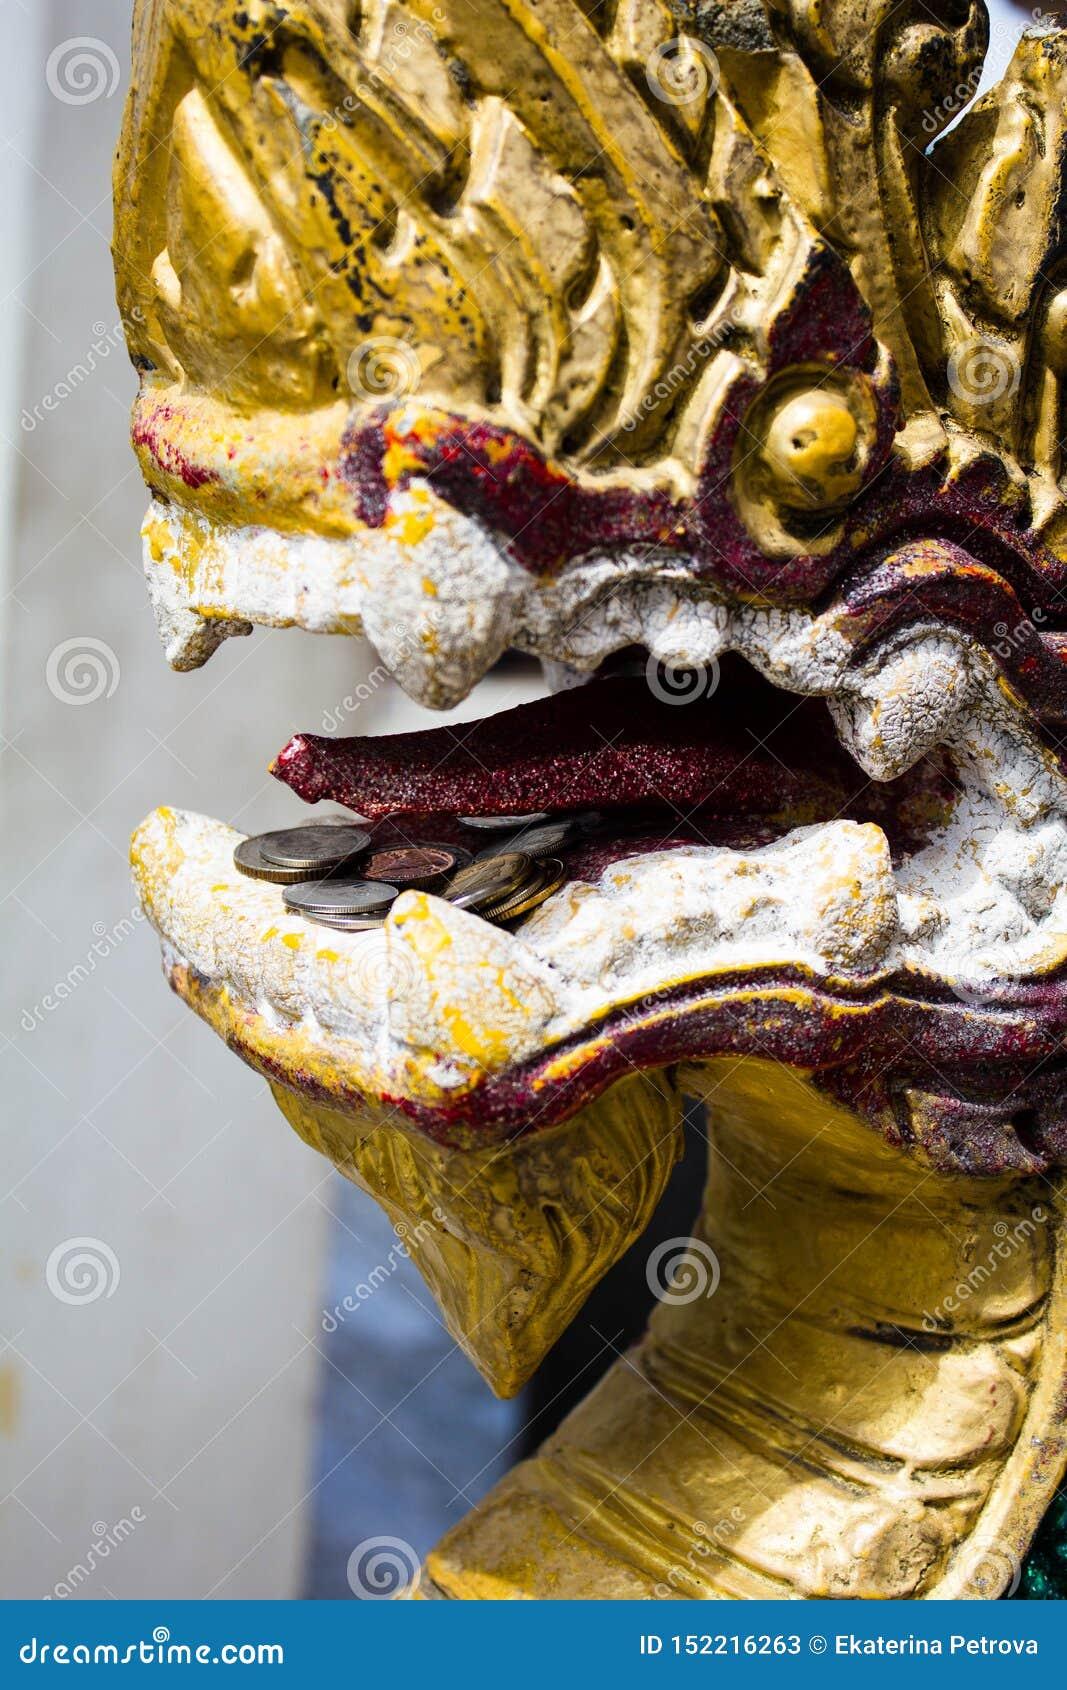 Dragon Laos Buddhist ancient sculpture. Golden dragon head closeup in Thailand in the temple